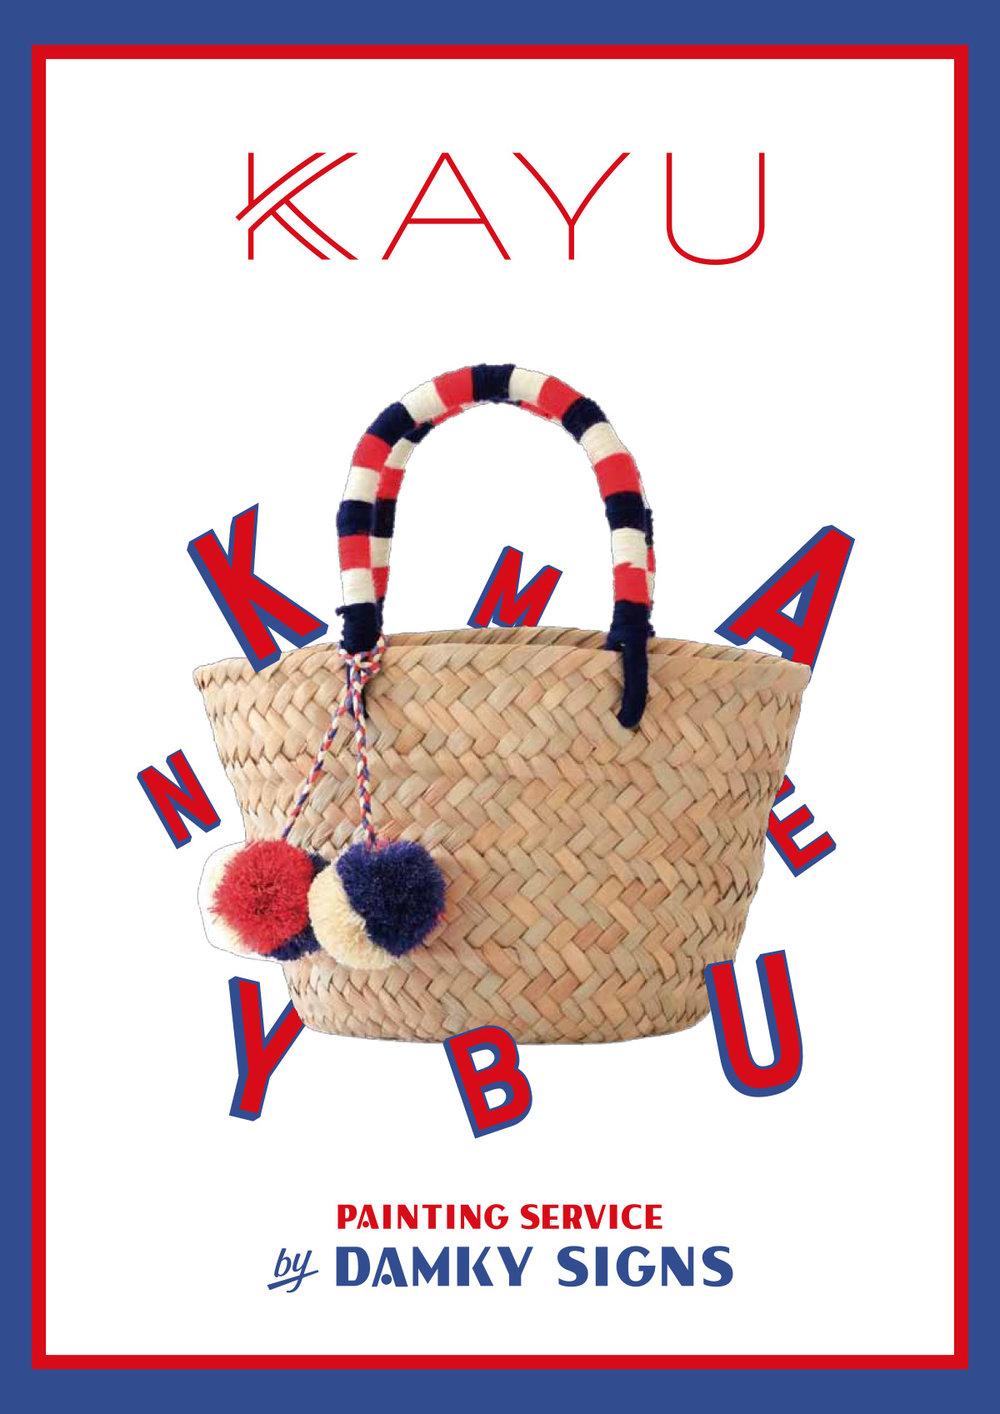 KAYU_02_s.jpg